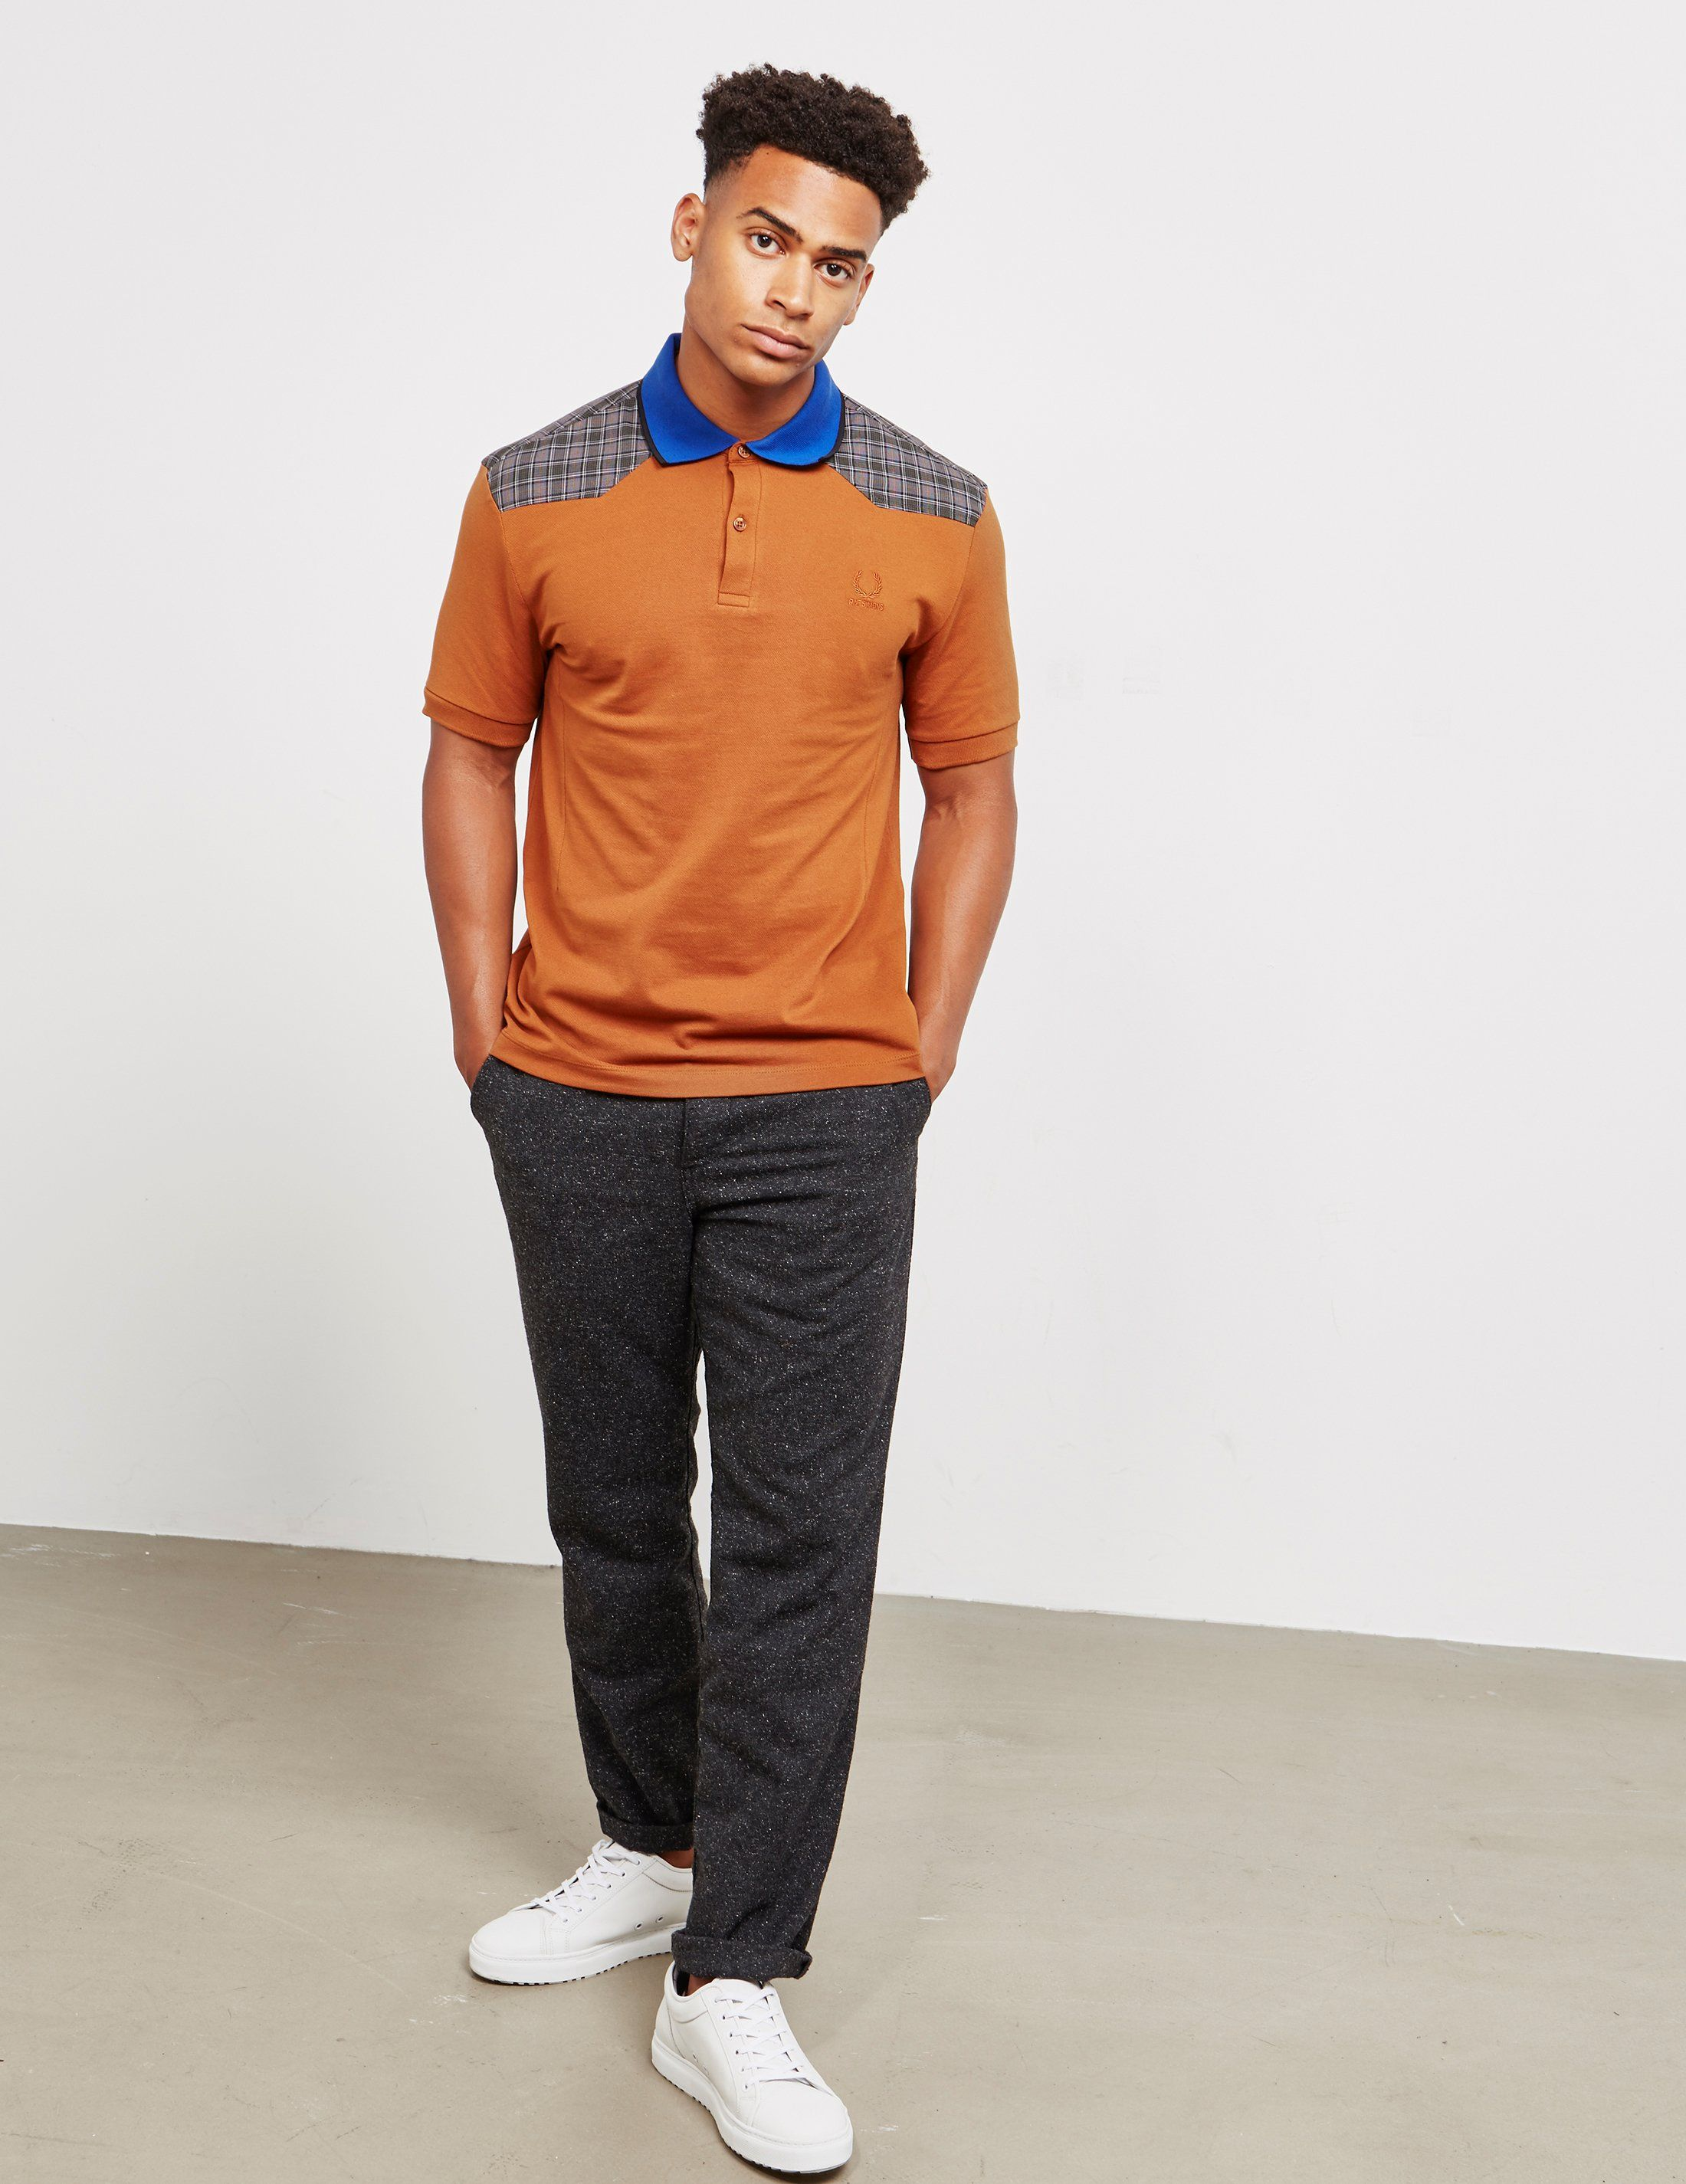 Fred Perry x Raf Simons Check Short Sleeve Polo Shirt